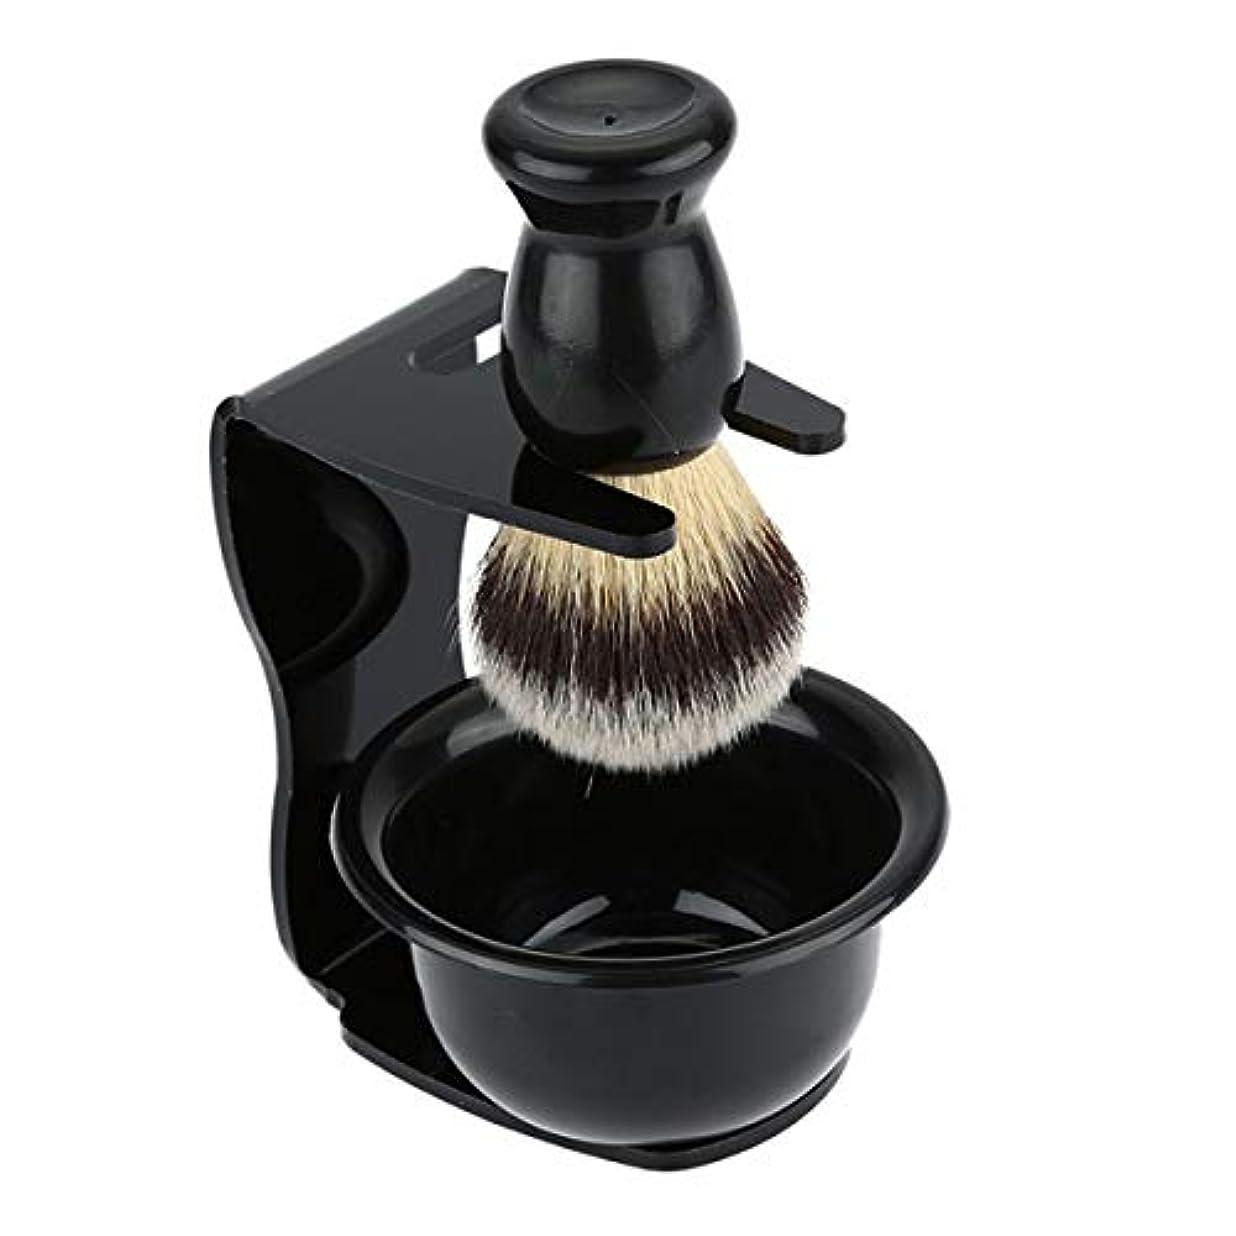 OUNONA ナイロンシェービングカミソリブラシアクリルスタンドと洗面化粧石鹸ボウルセット